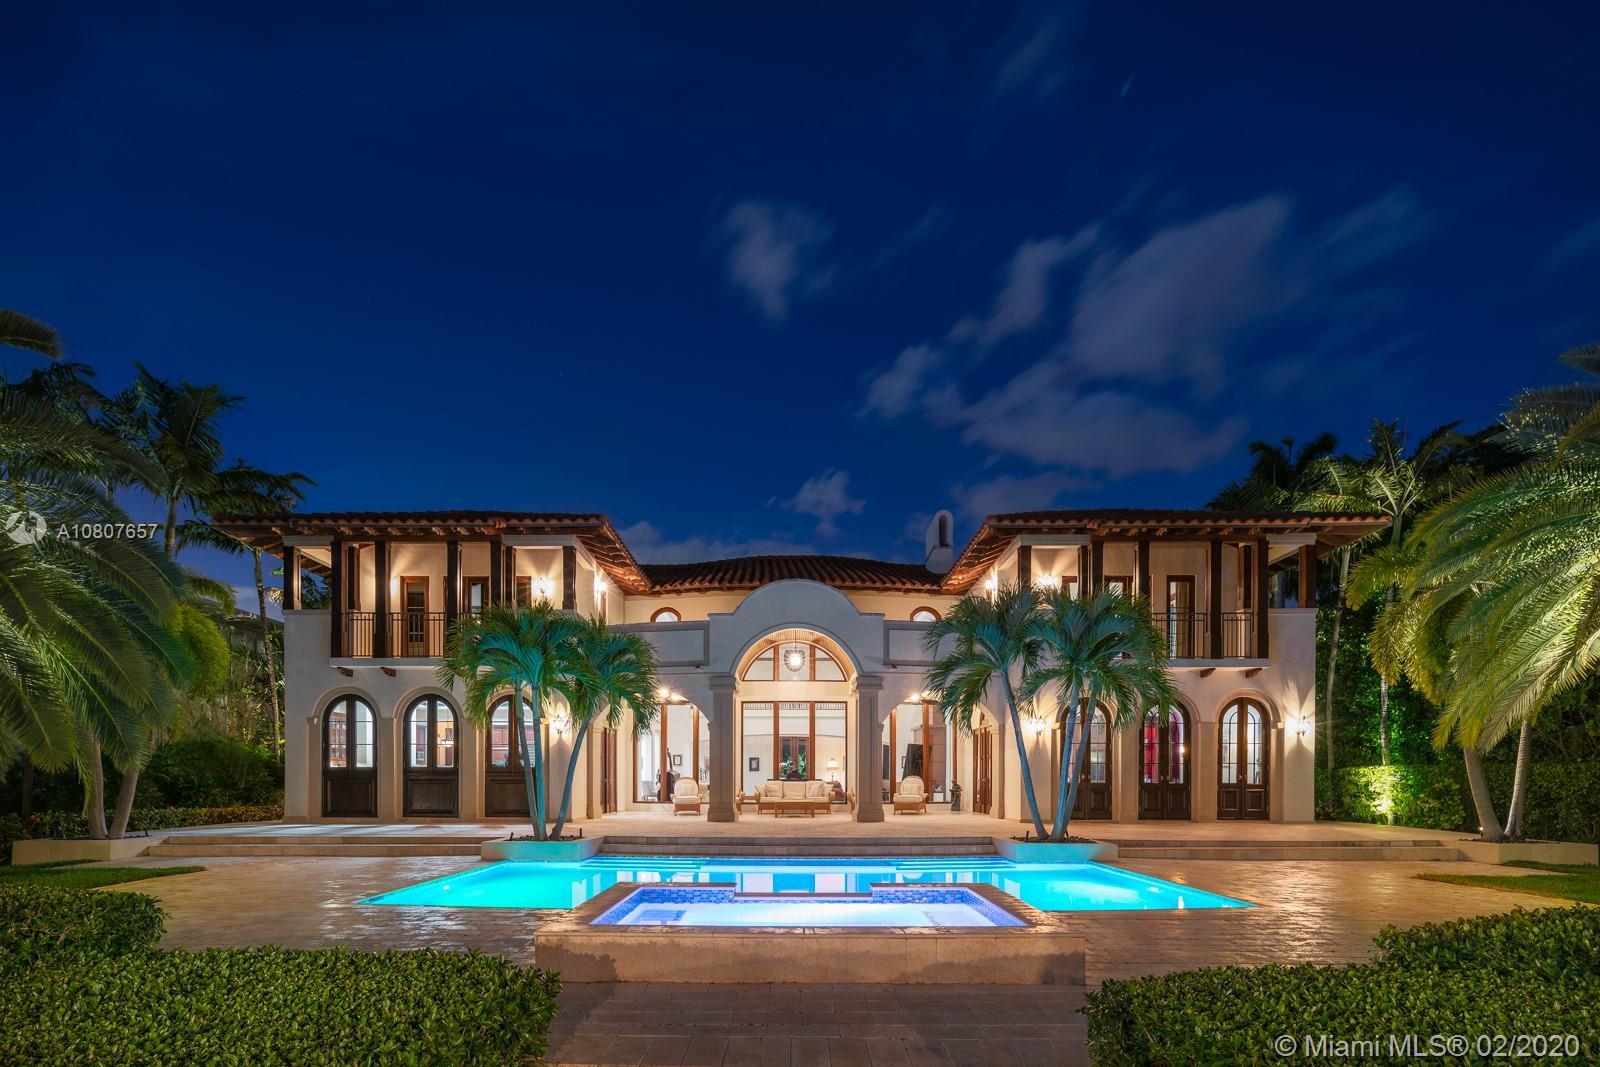 9410 W Broadview Dr, Bay Harbor Islands, FL 33154 - Bay Harbor Islands, FL real estate listing